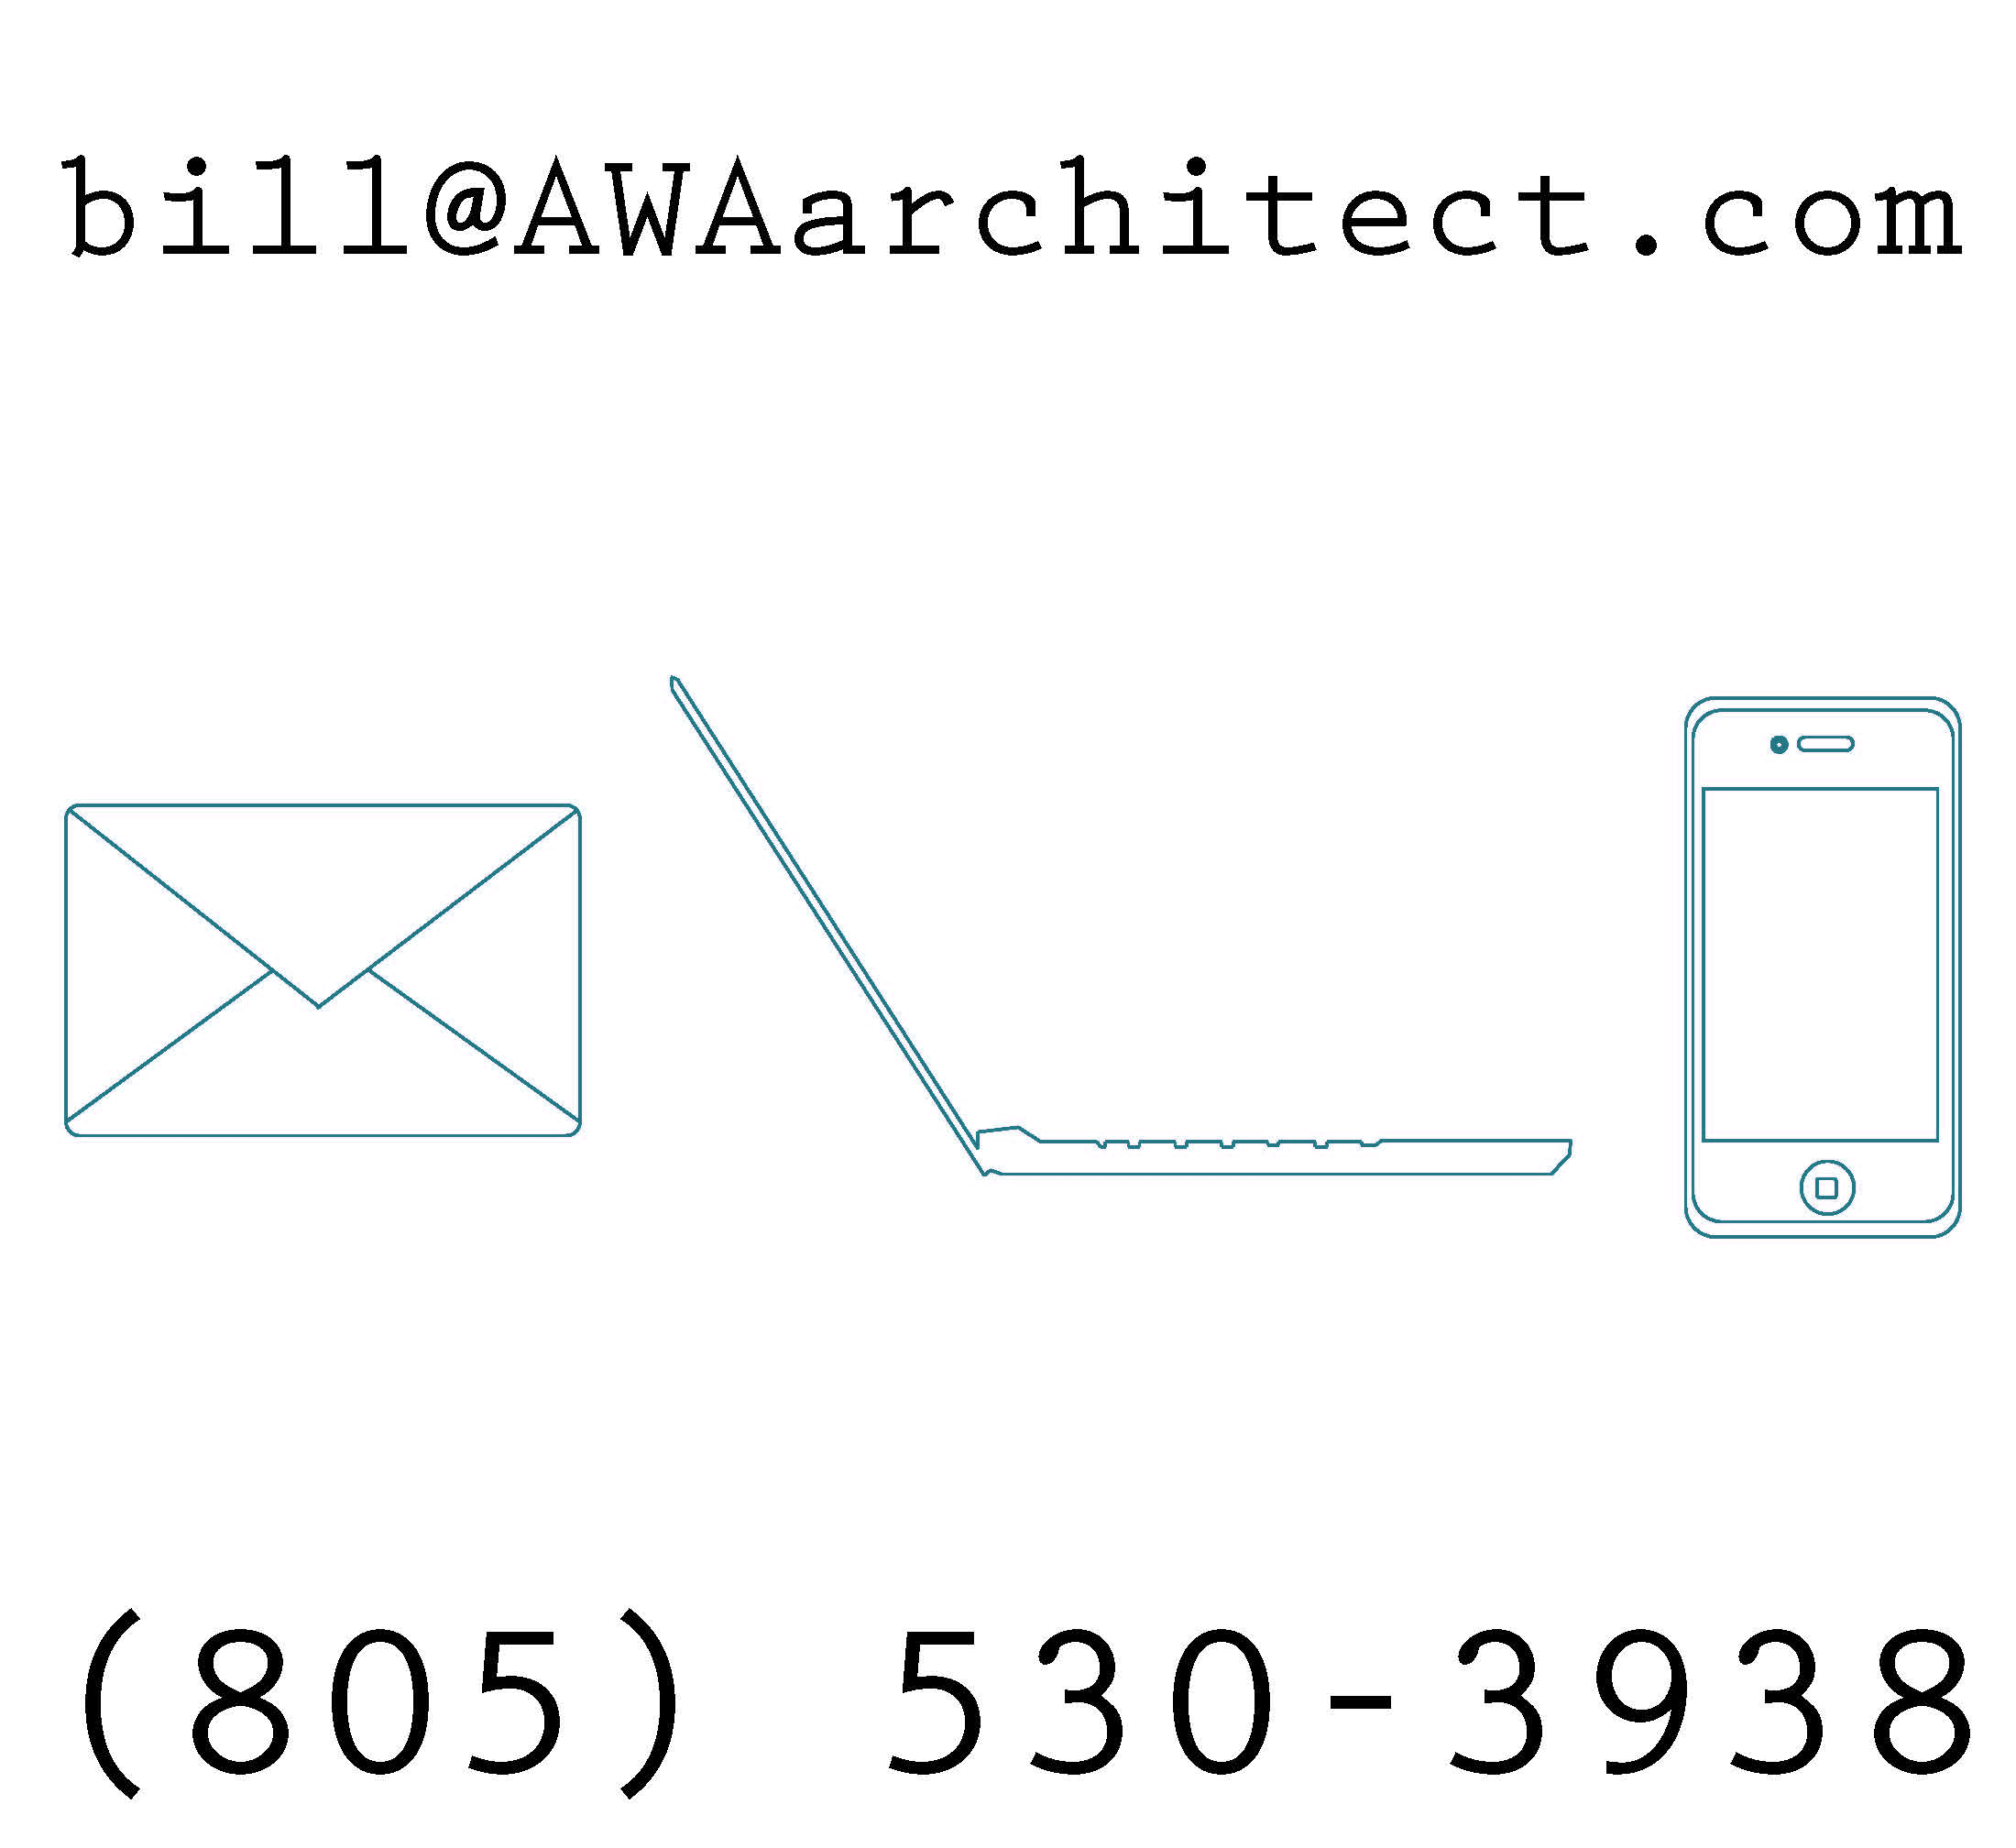 ContactGraphic.jpg